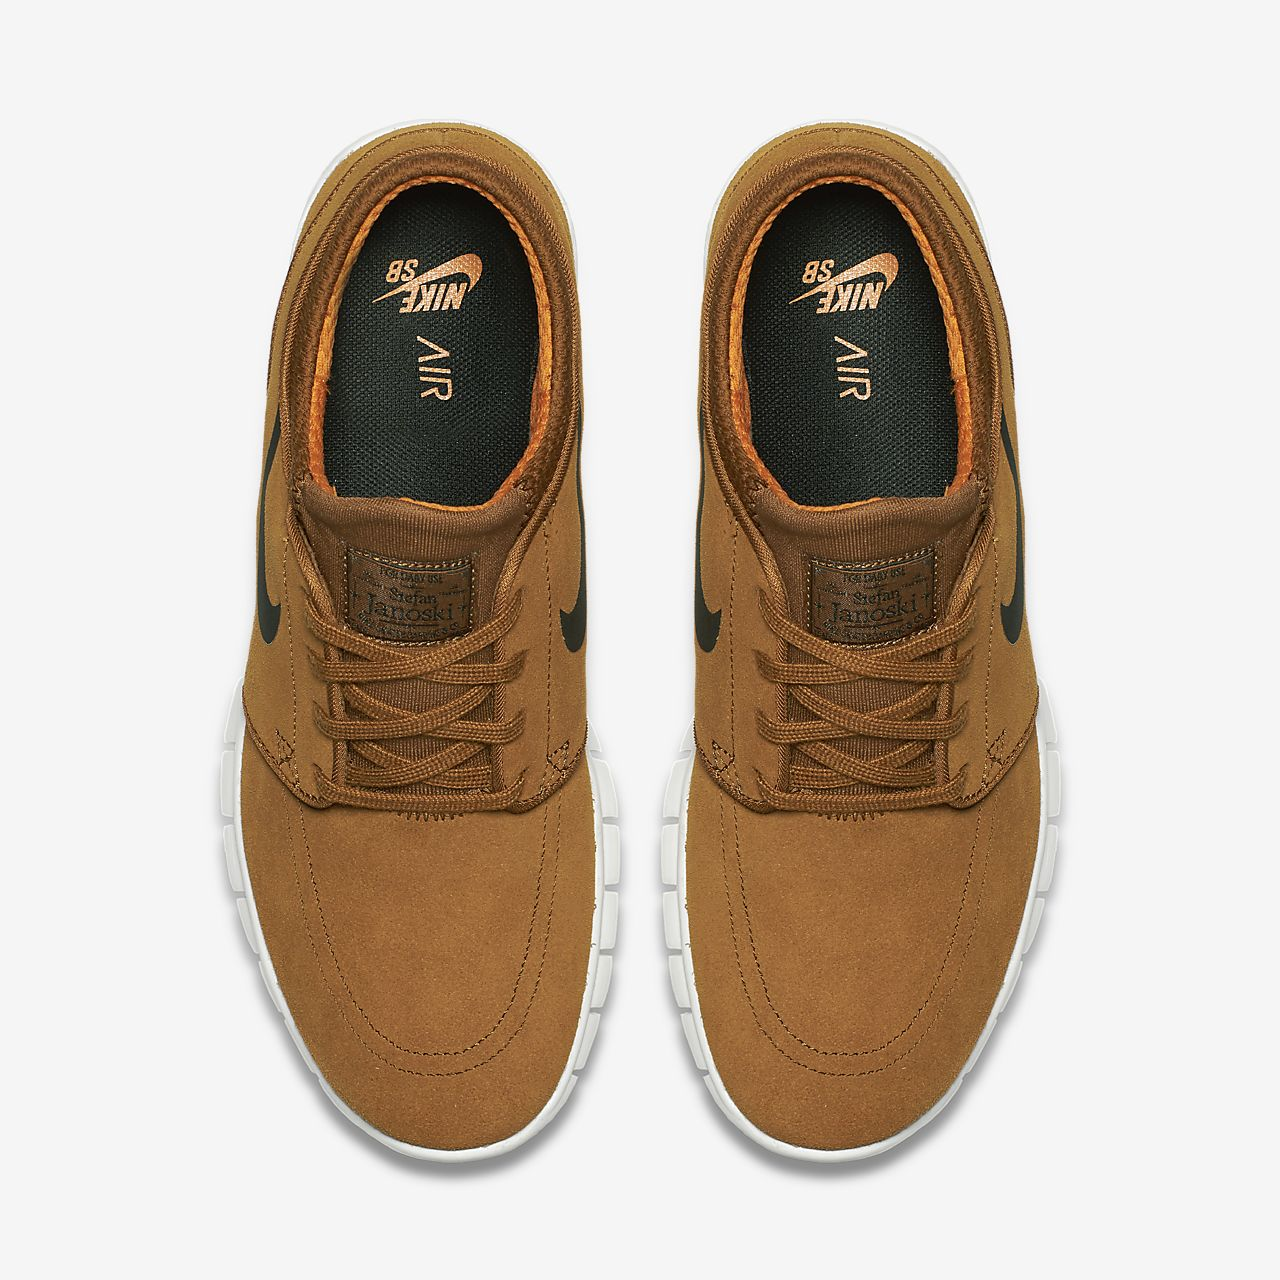 buy popular 283a4 810ad ... Nike SB Stefan Janoski Max L Men s Skateboarding Shoe